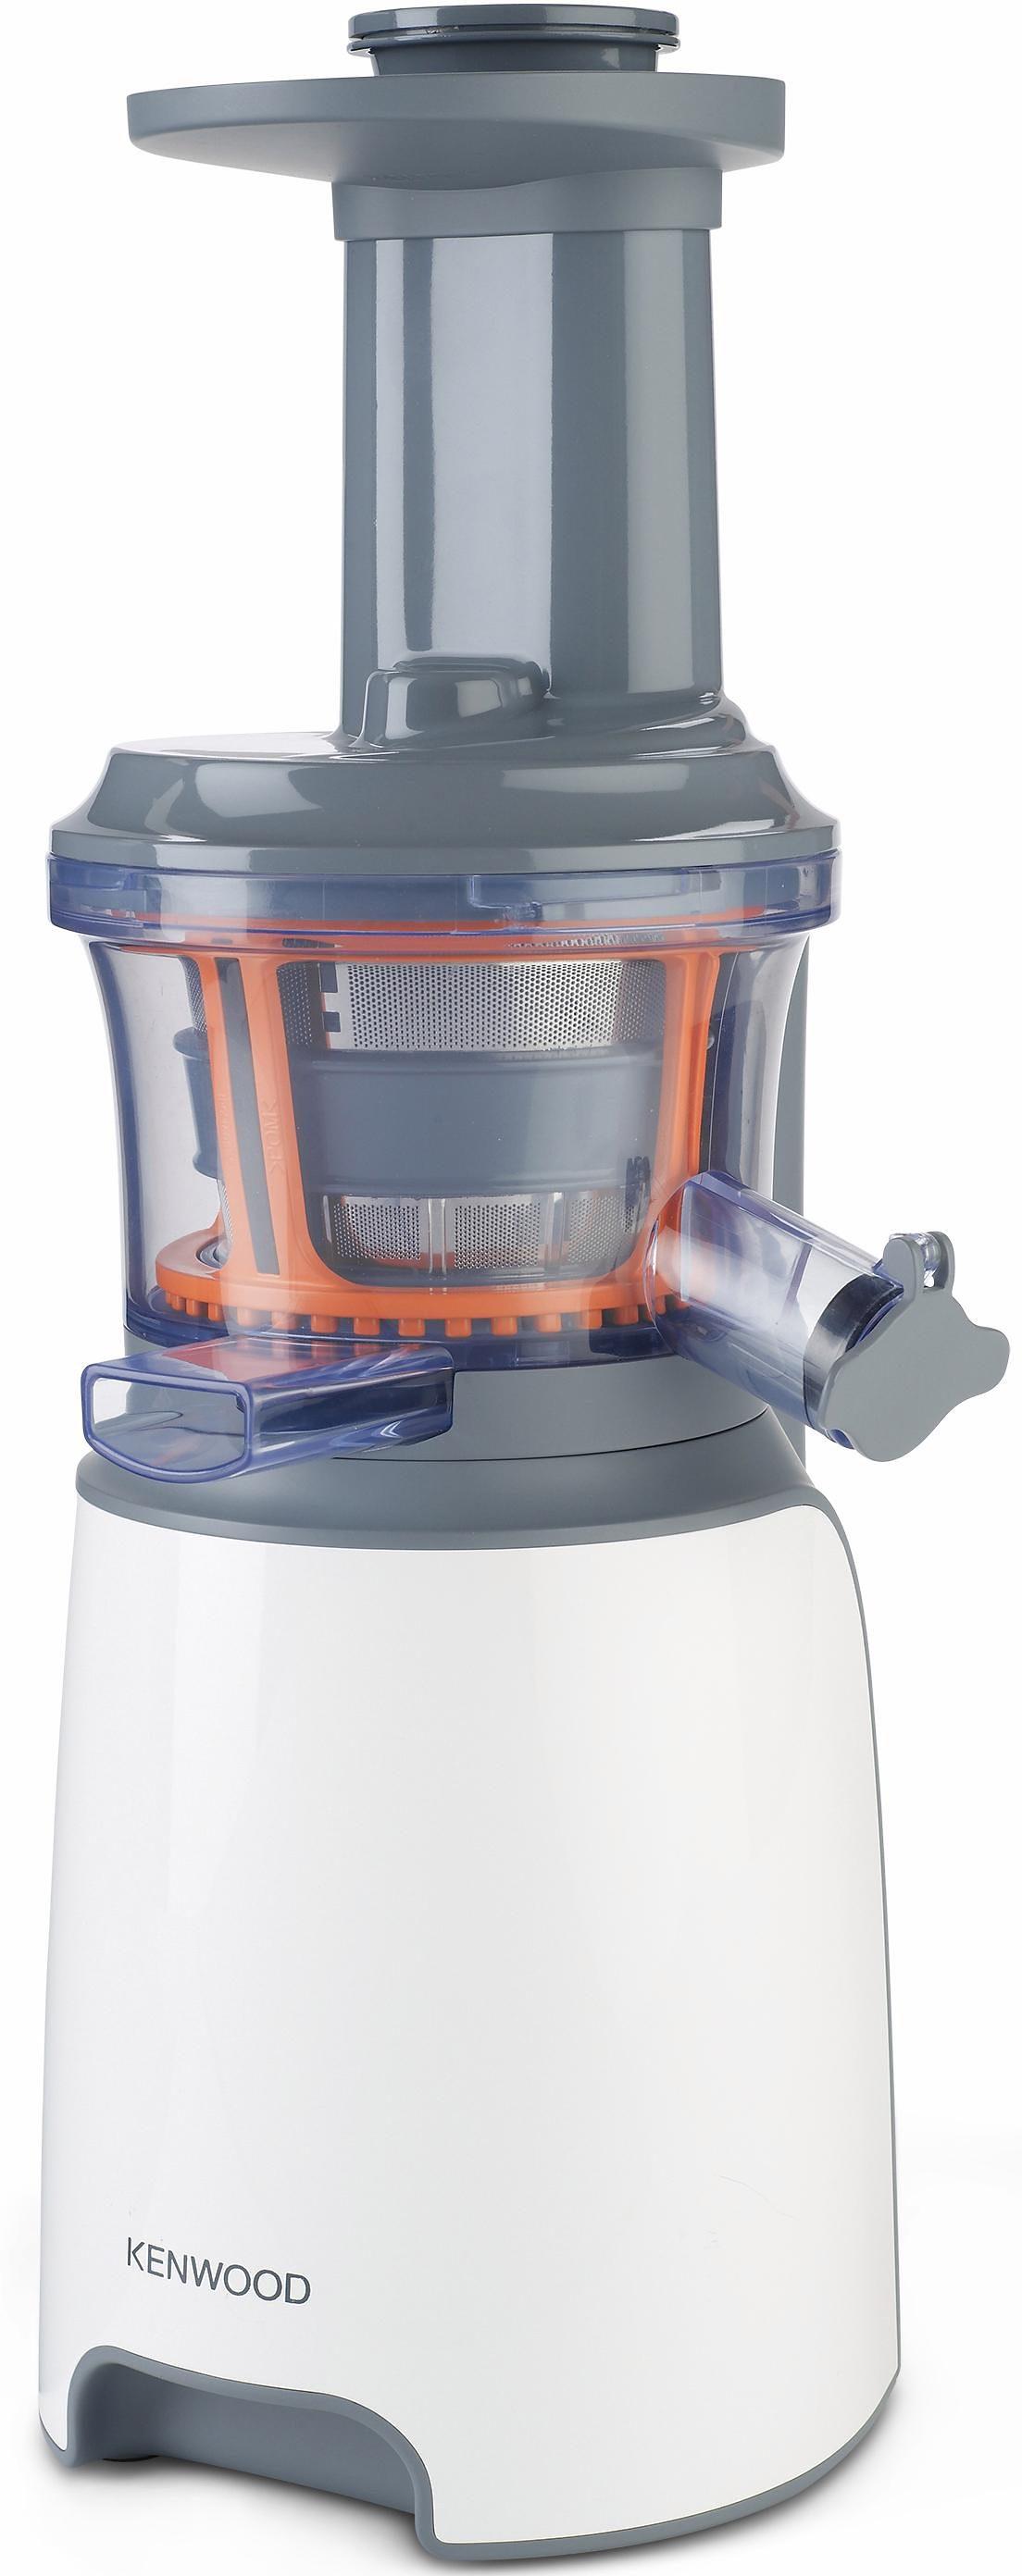 KENWOOD Slow Juicer Slow Juicer JMP 600 WH, 150 W, 150 Watt, 1,3 l Tresterbehälter